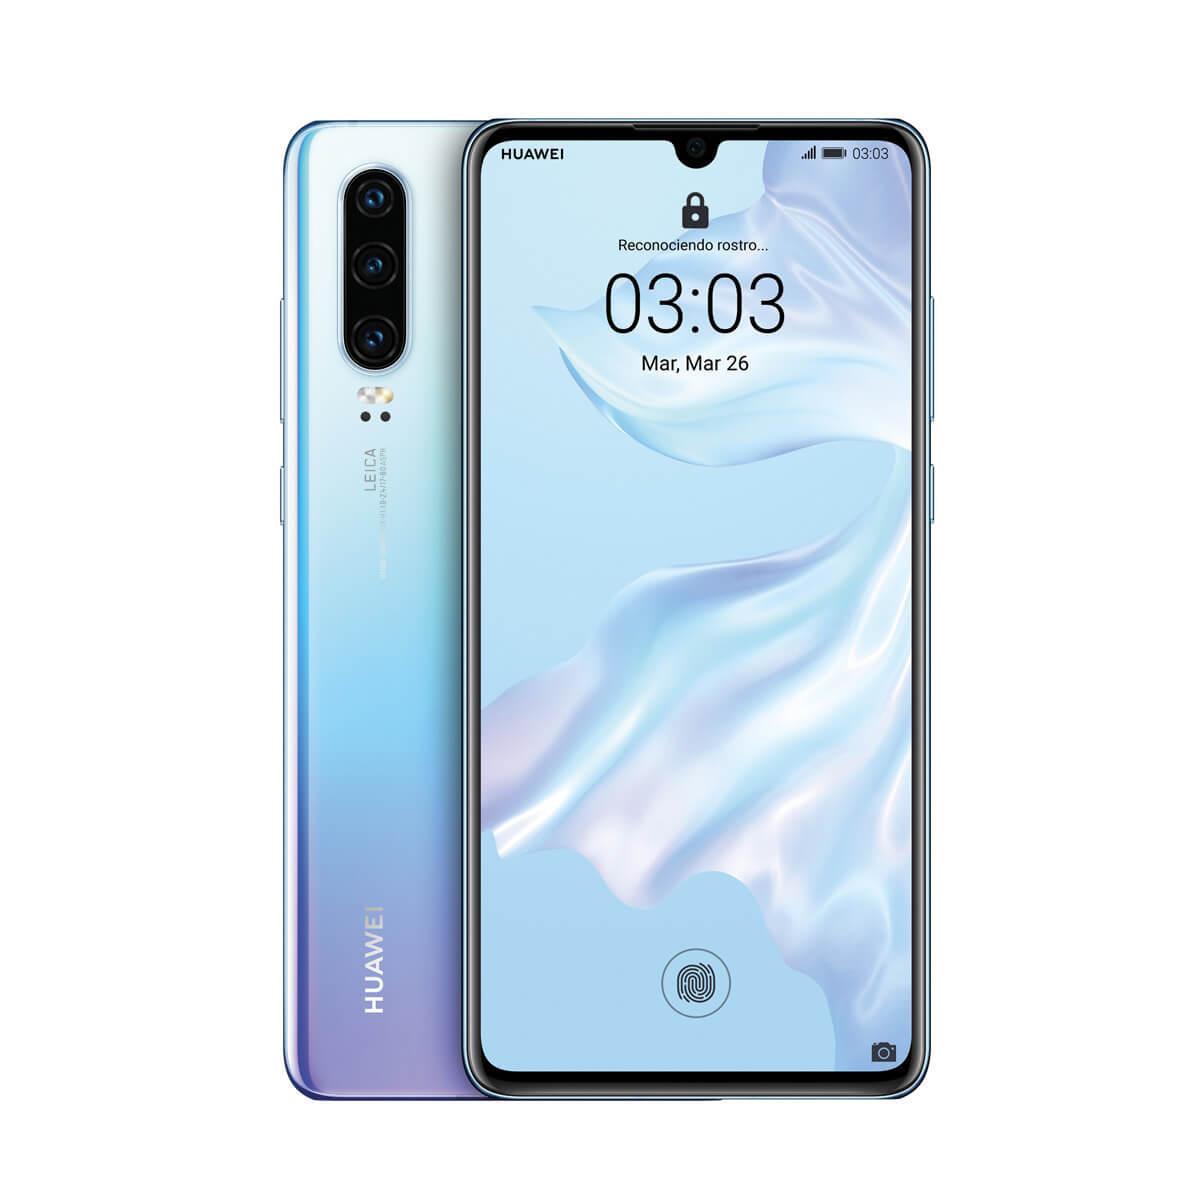 Huawei P30 6/128GB Nácar